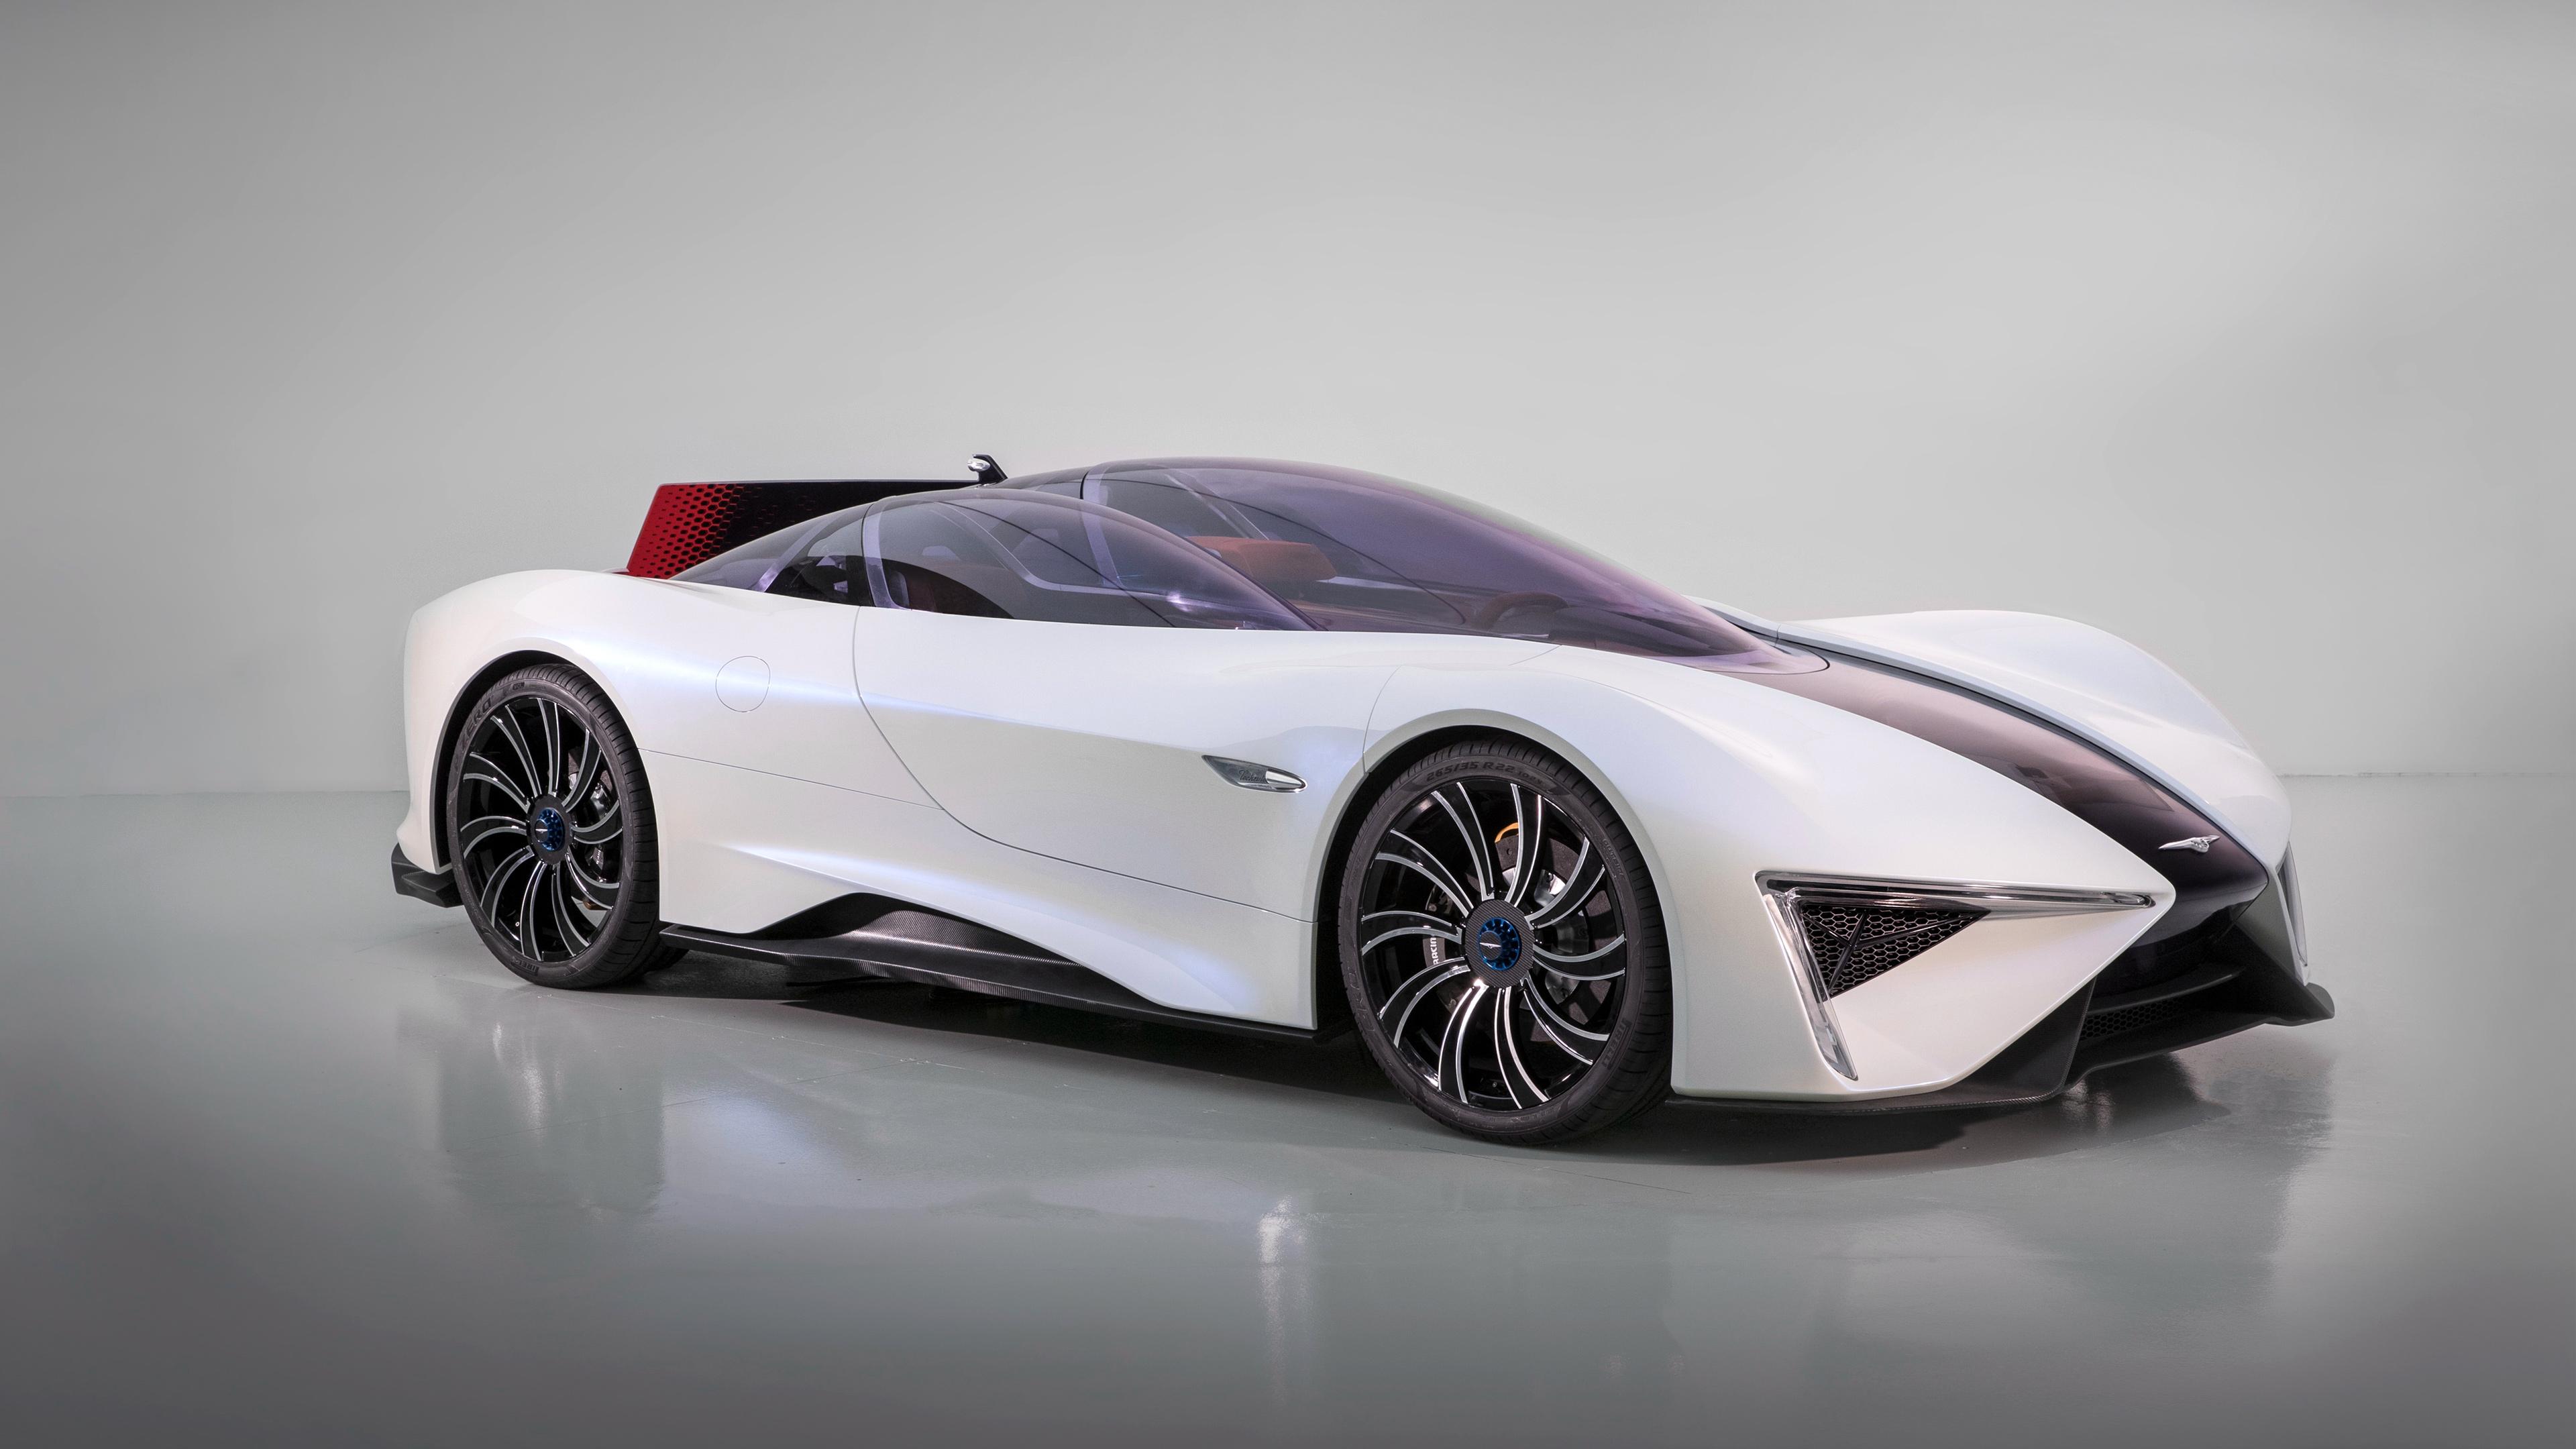 Techrules ren supercar 4k. обои скачать